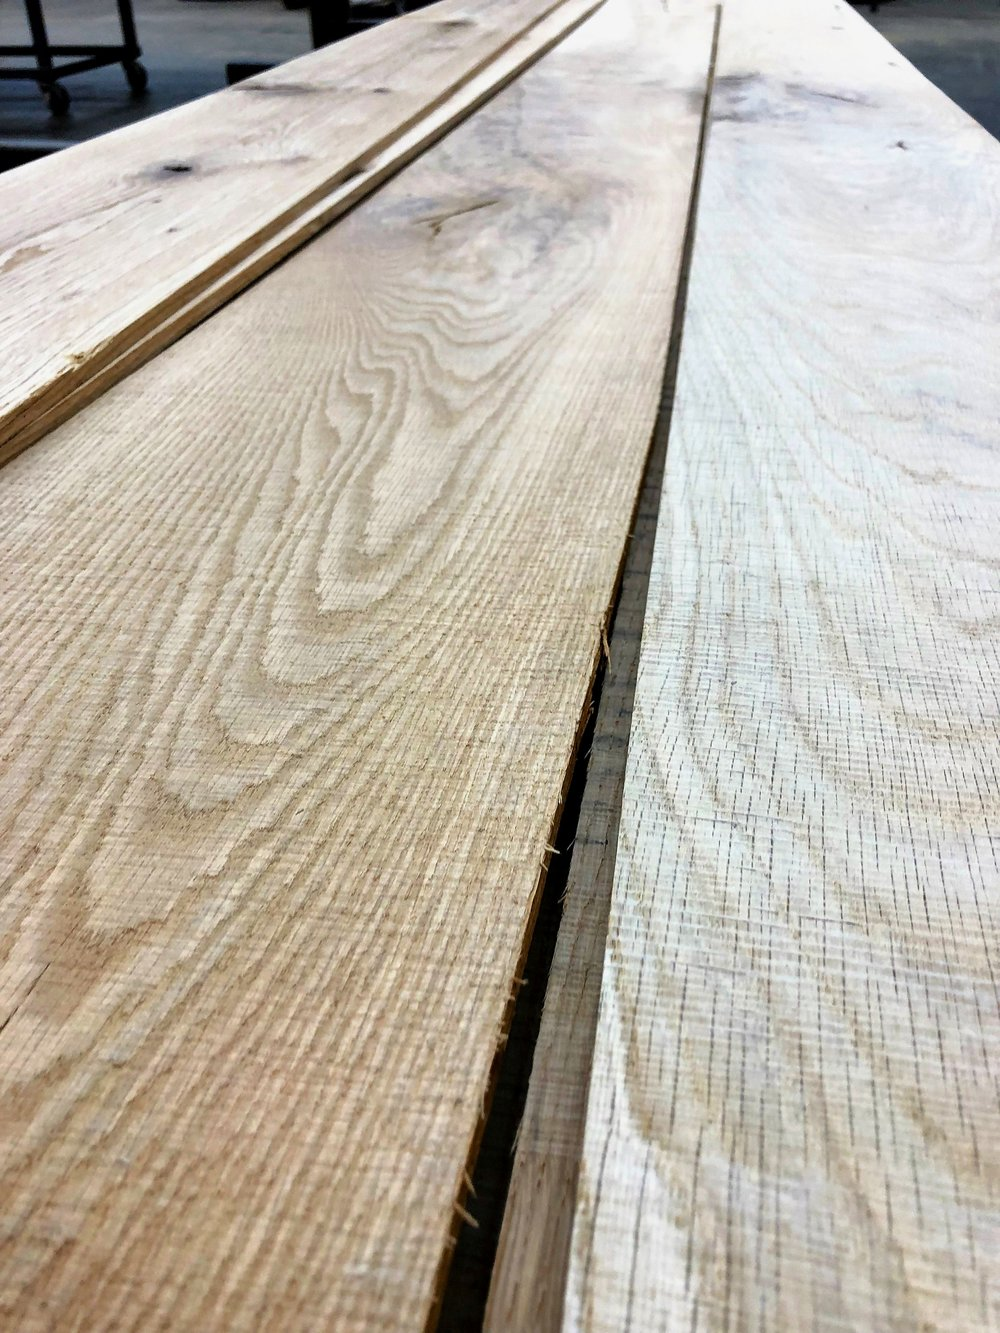 White Oak, European Sawn